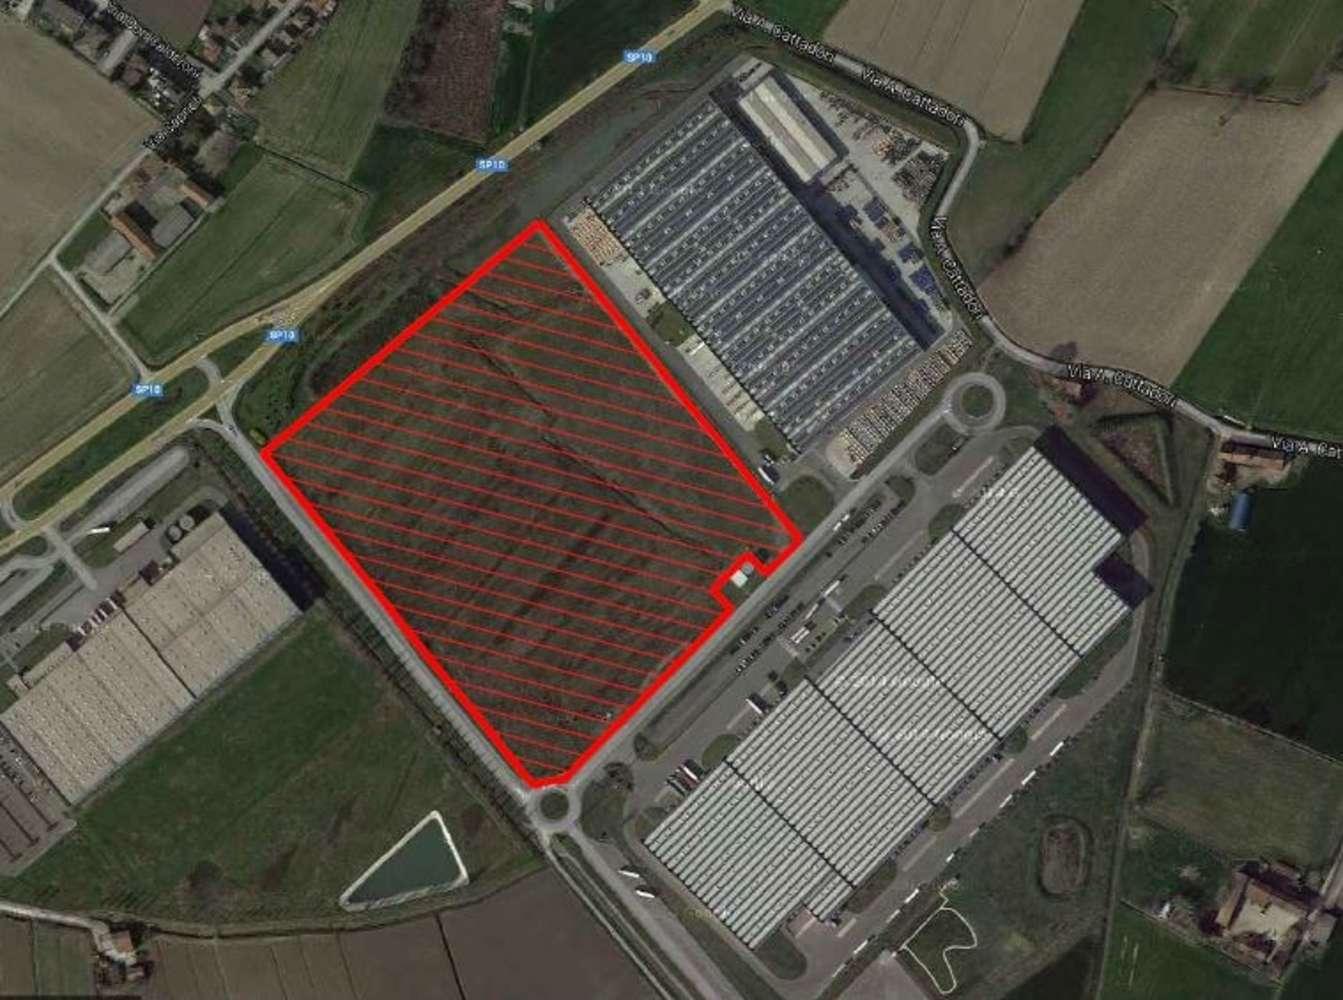 Magazzini industriali e logistici Monticelli d'ongina, 29010 - Monticelli d'Ongina - Piacenza - 9375270